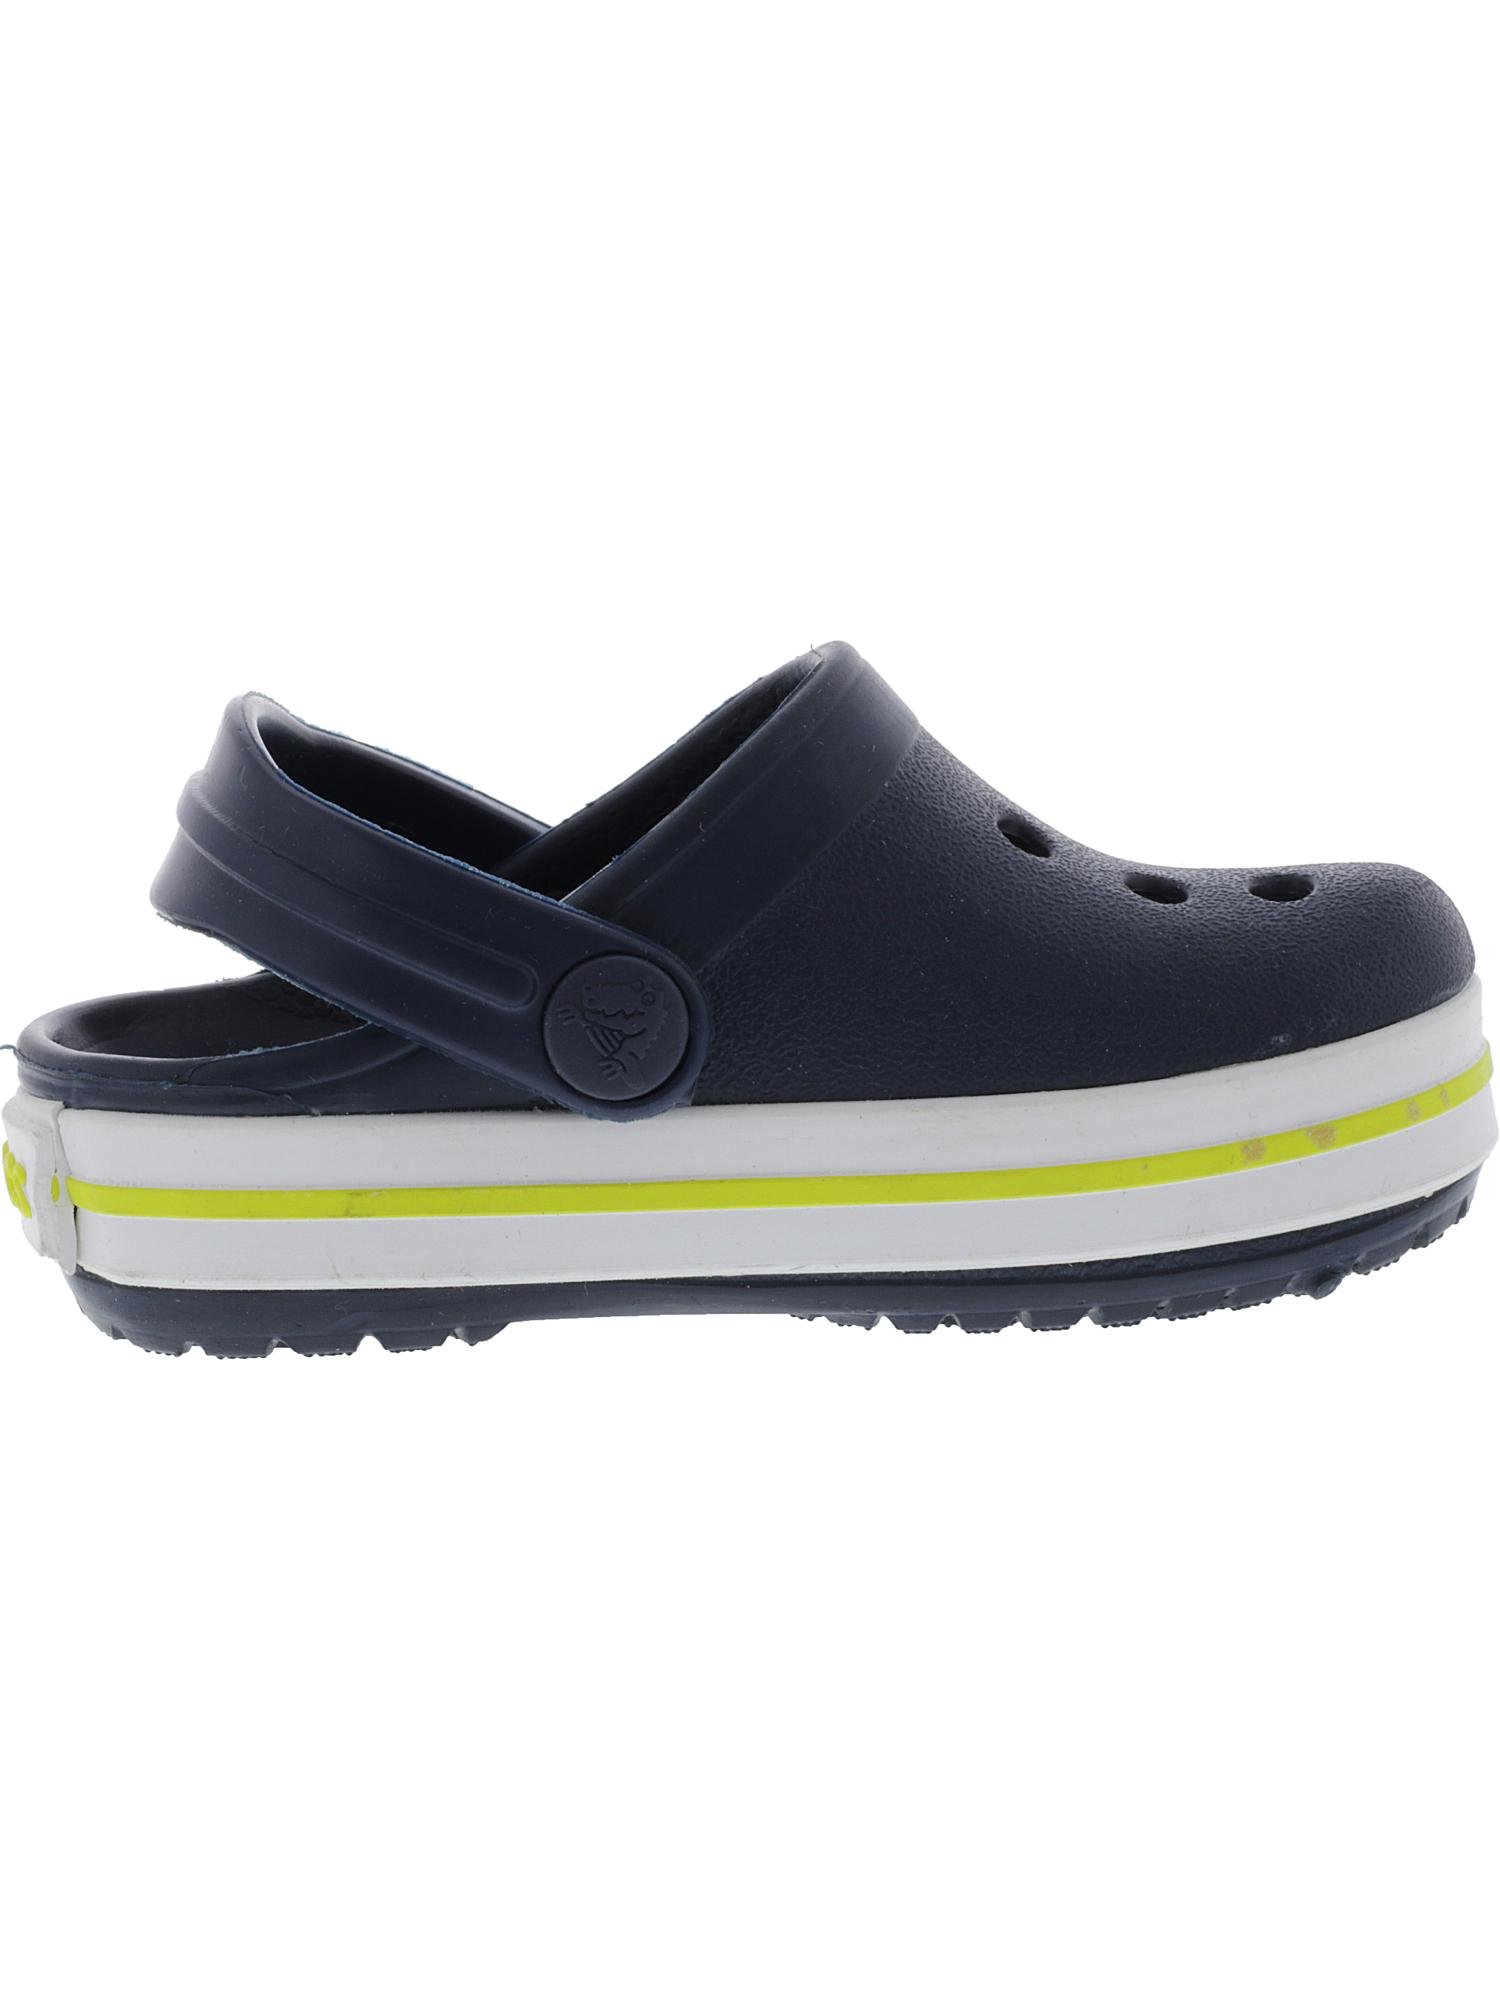 Crocs-Kids-Crocband-Clog-Ltd-Clogs Indexbild 5